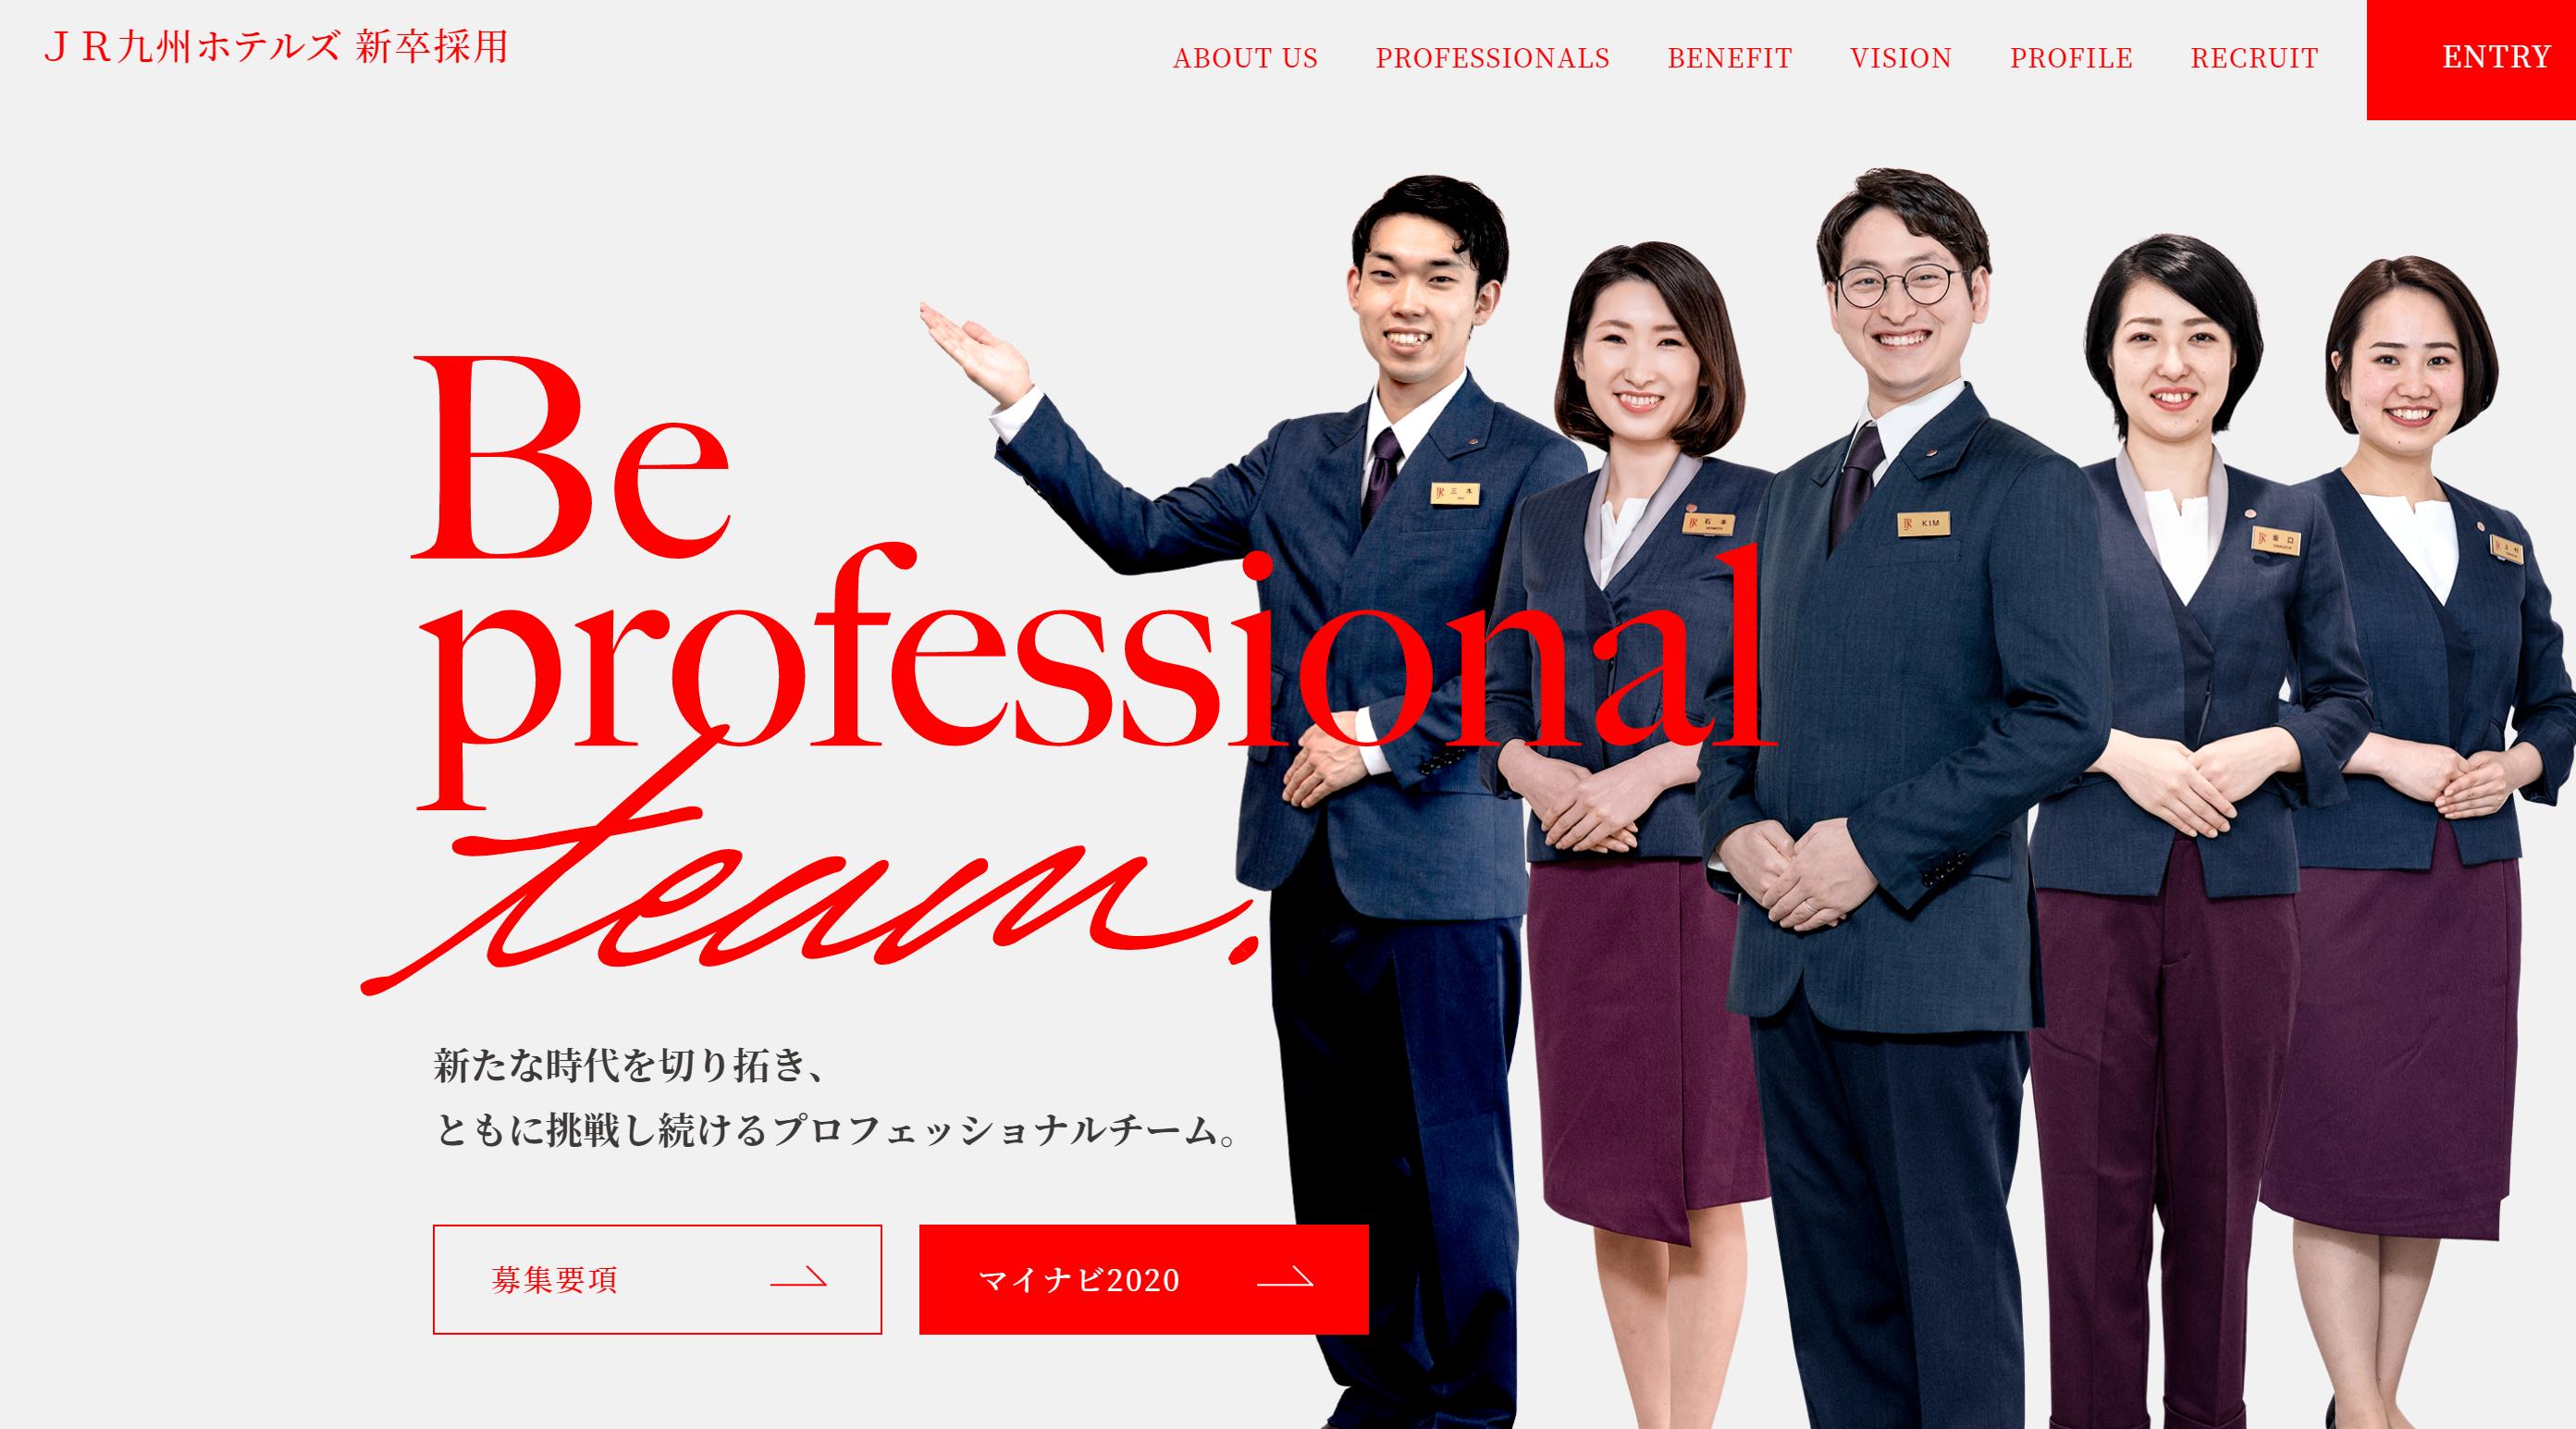 JR九州ホテルズ採用サイト